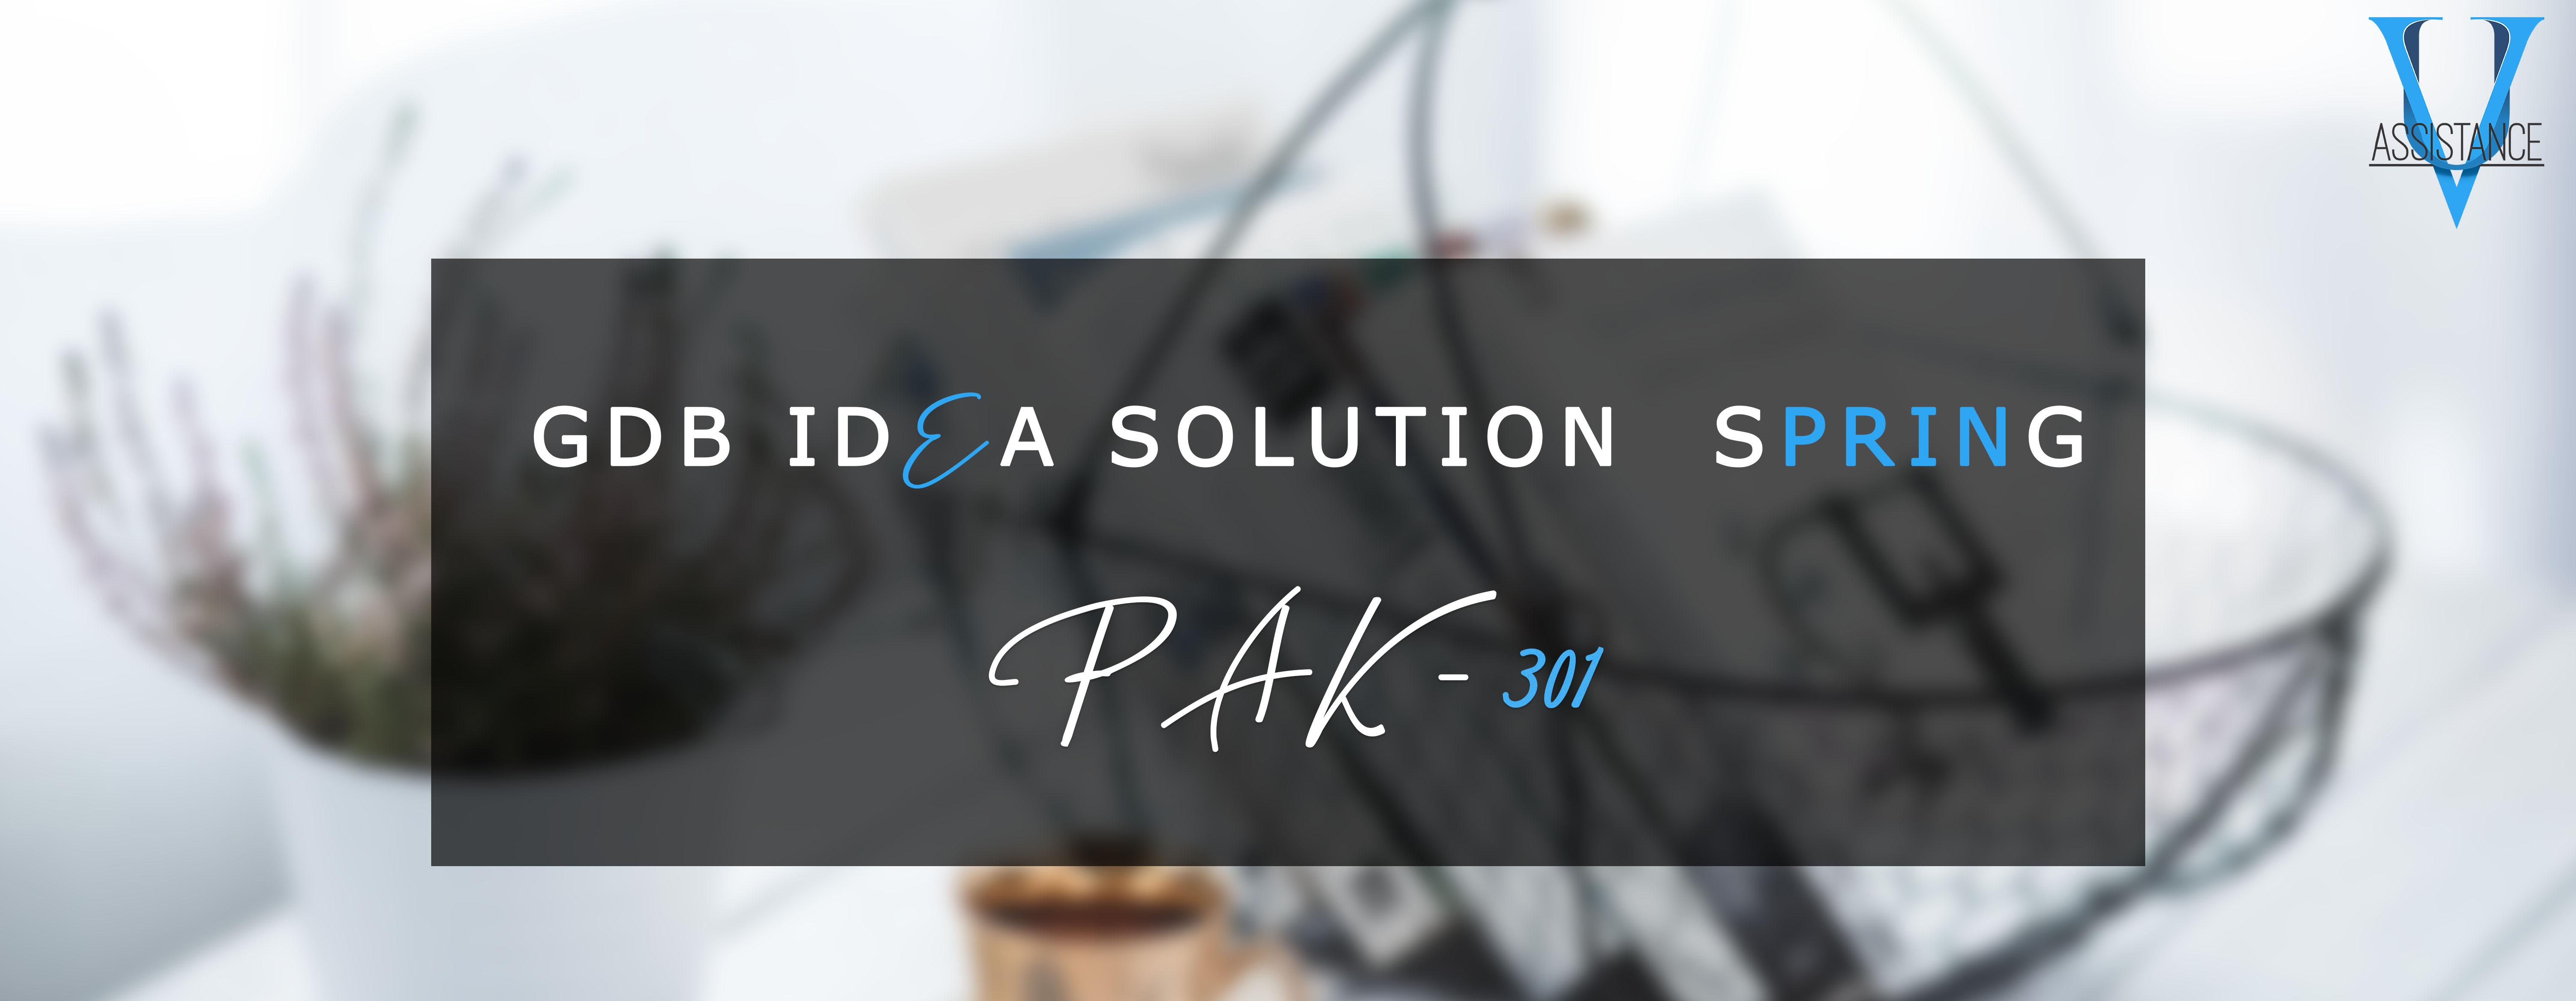 PAk301 Gdb solution